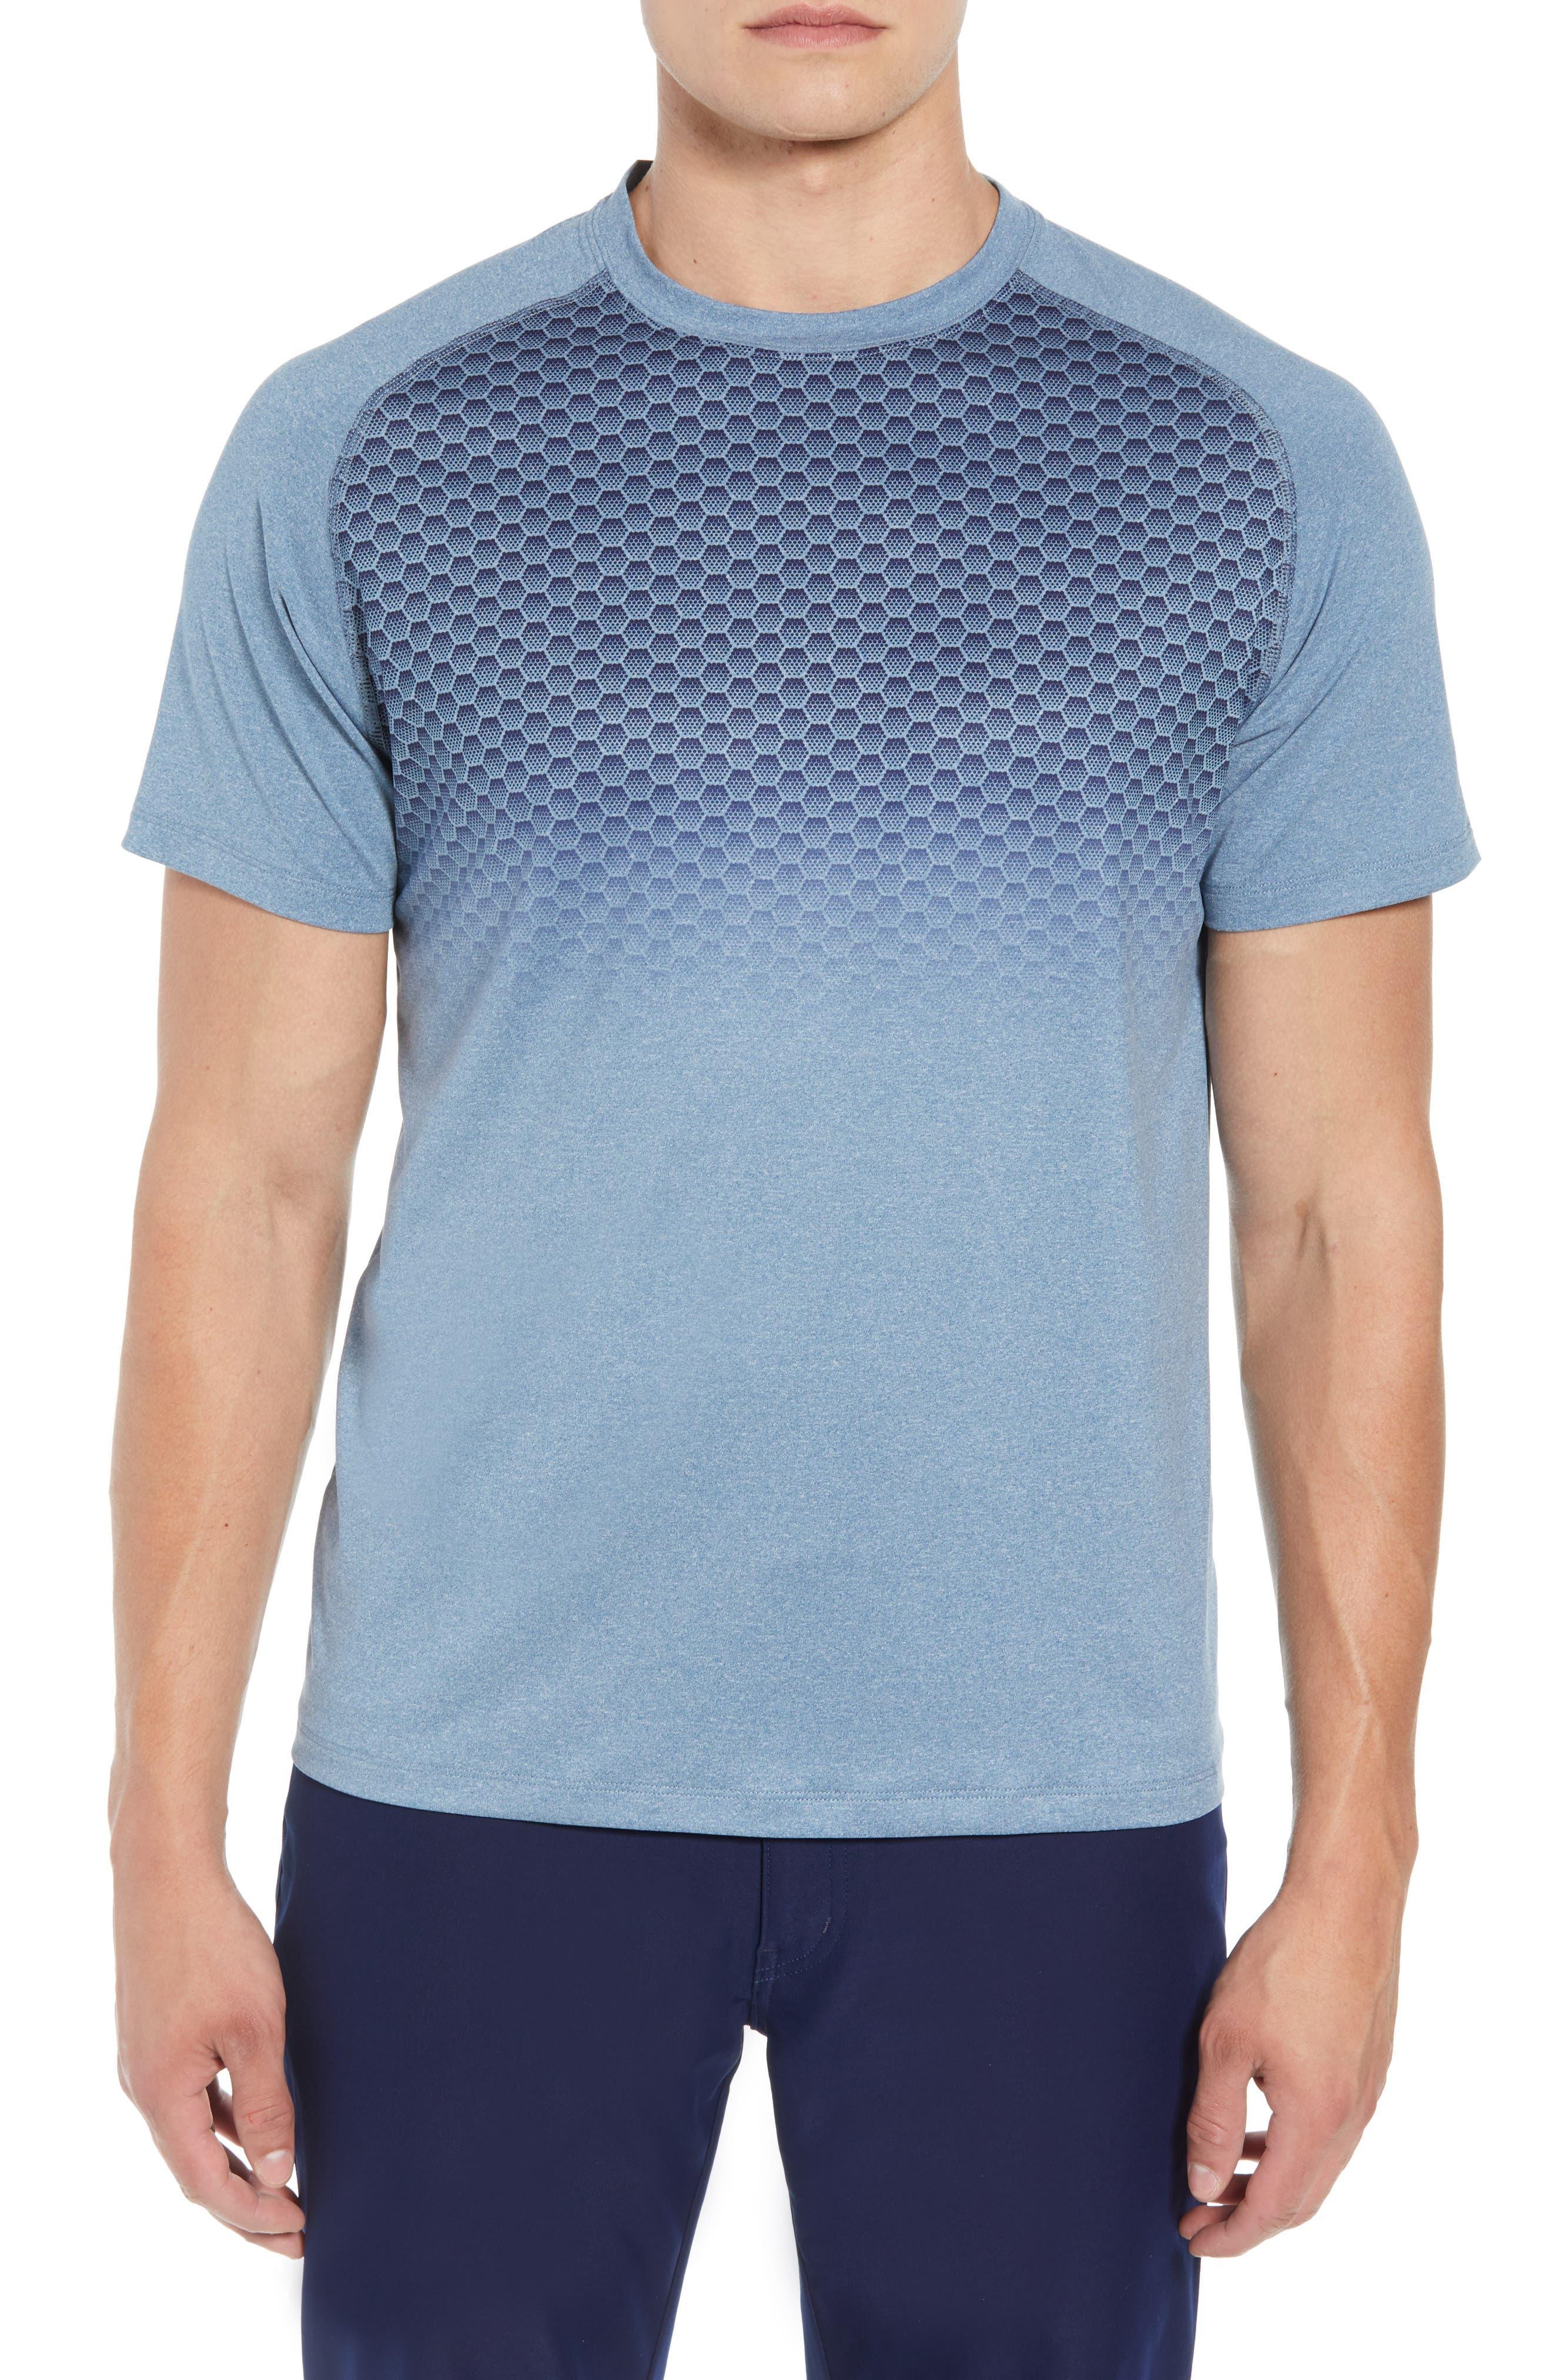 Rio Honeycomb Print Performance T-Shirt,                             Main thumbnail 1, color,                             BROWN